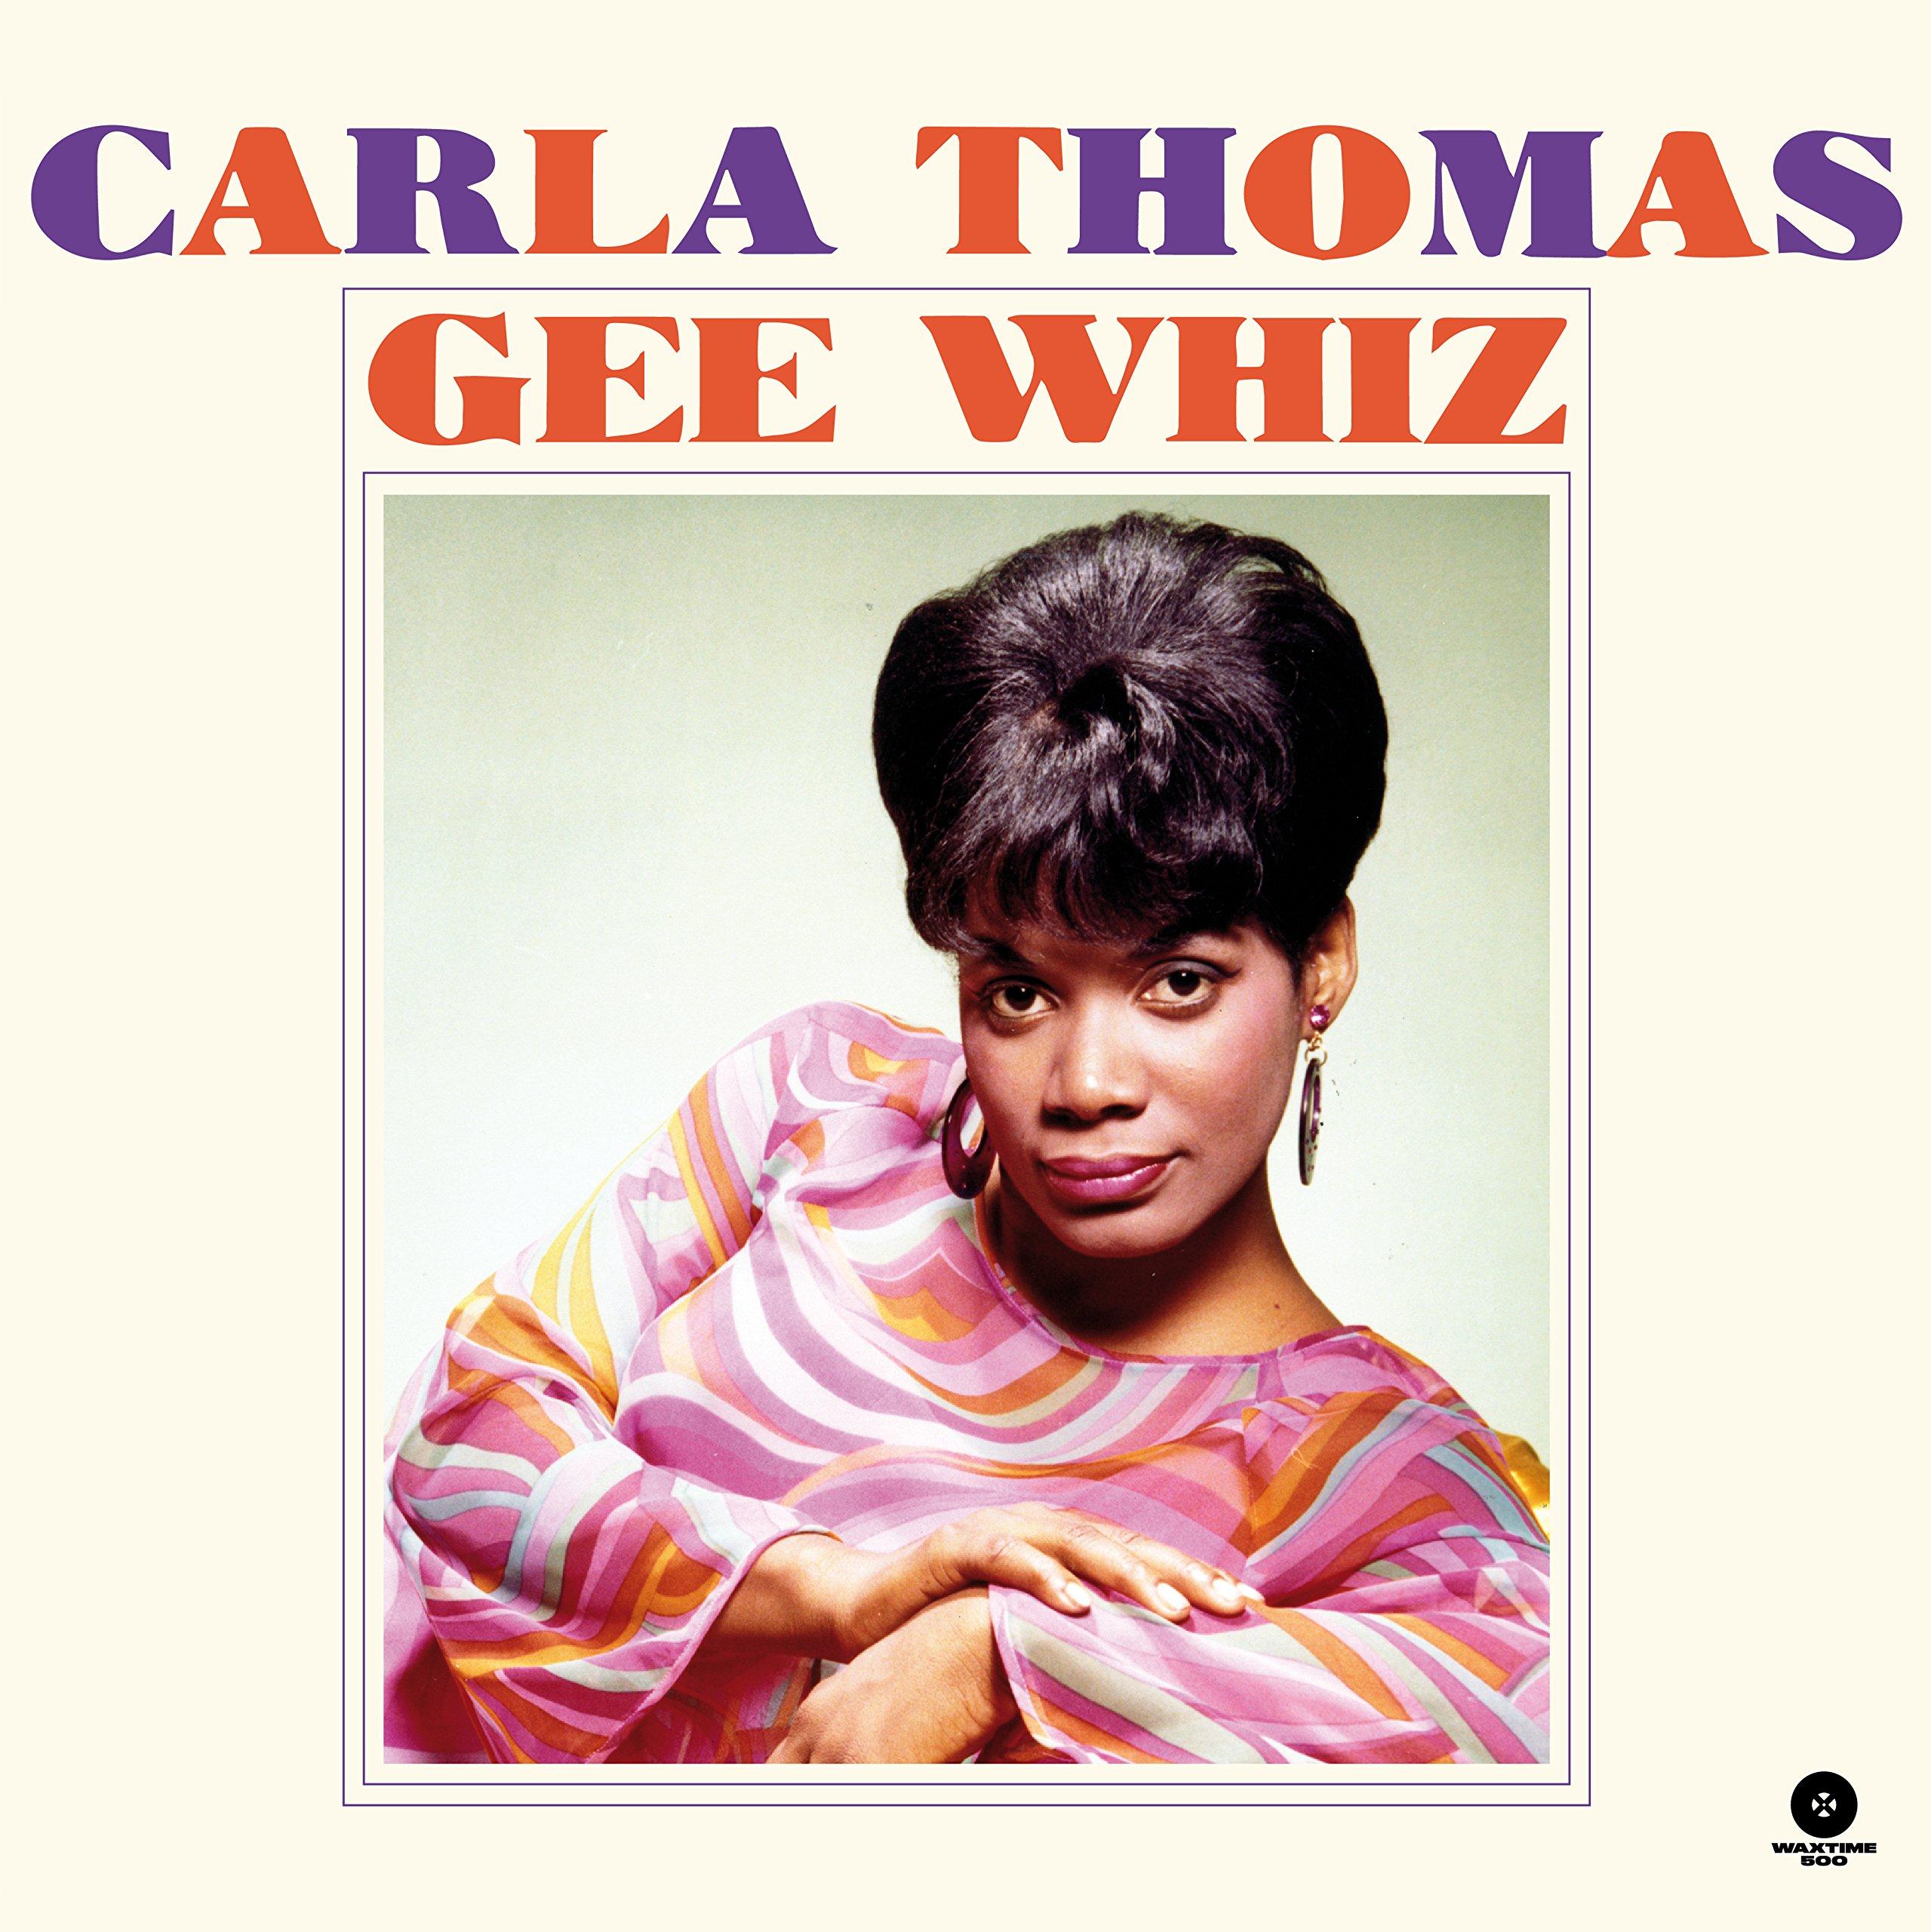 Vinilo : Carla Thomas - Gee Whiz (Limited Edition, 180 Gram Vinyl, Bonus Tracks, Collector's Edition, Virgin Vinyl)